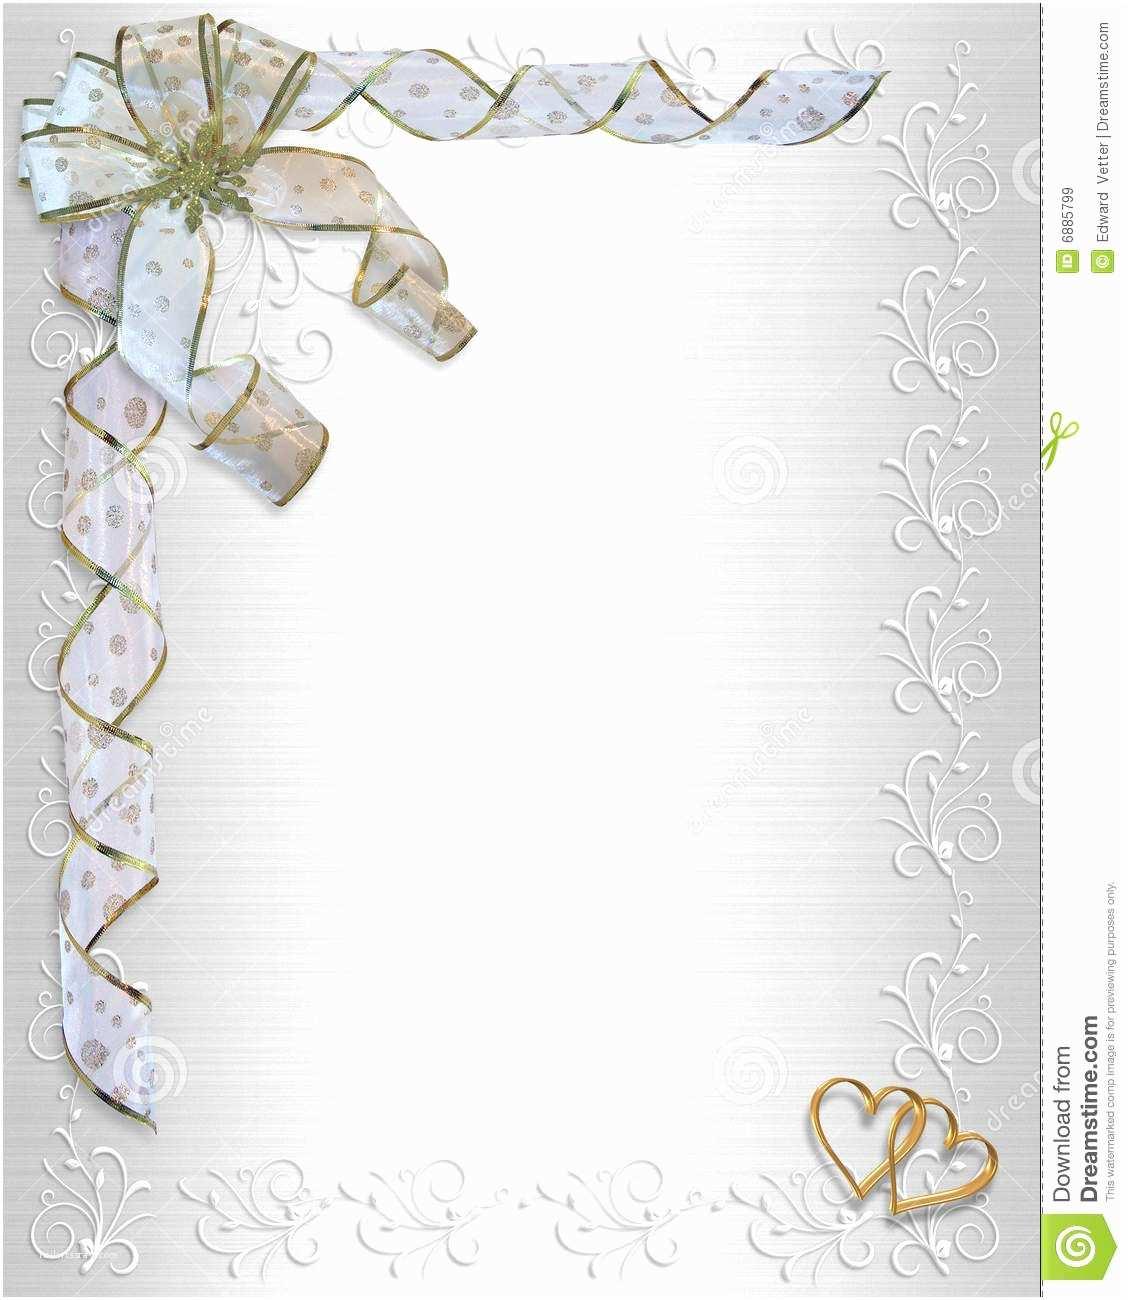 How to Design Wedding Invitations top Pilation Wedding Invitation Borders